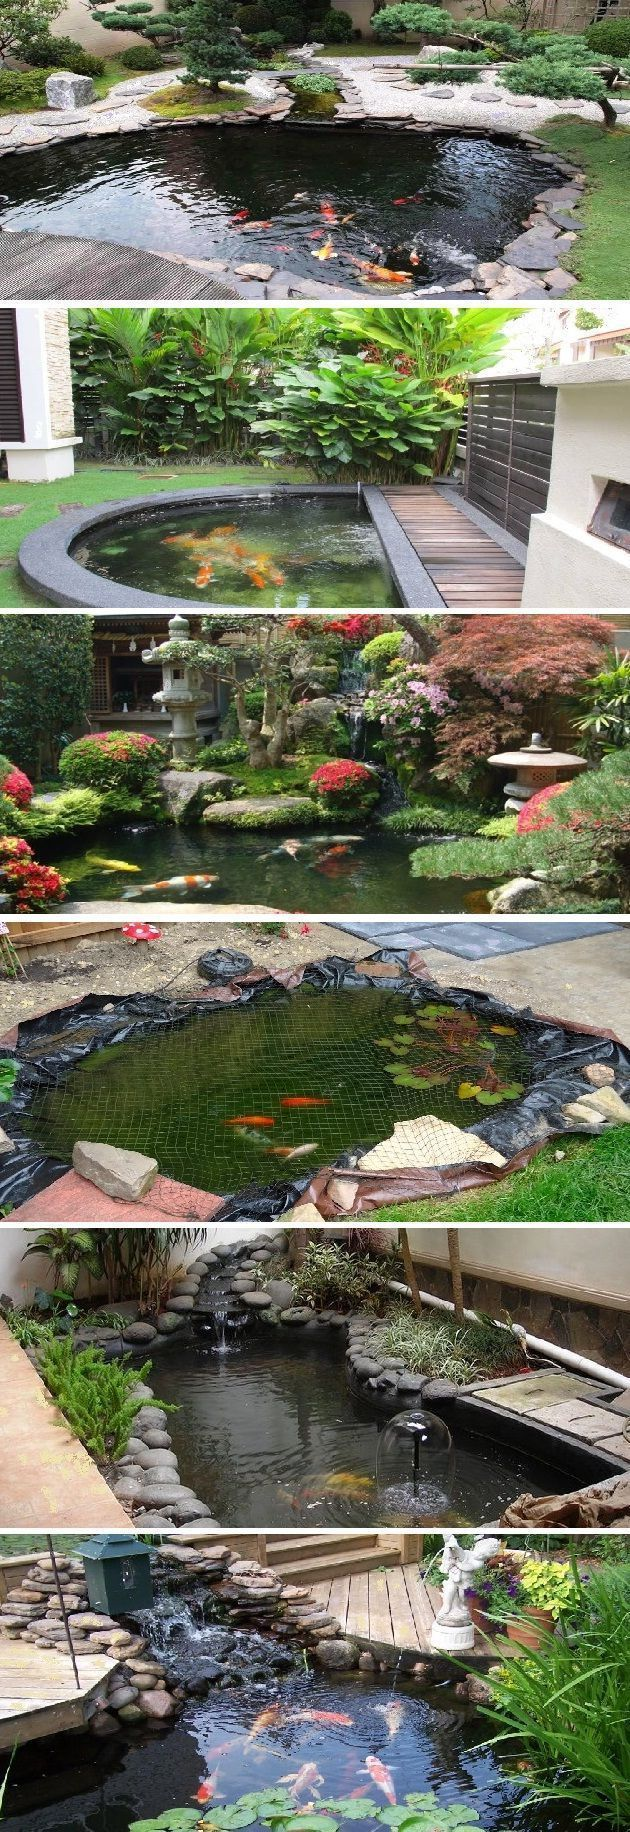 15 Japanese Koi Ponds For Your Garden Top Diy Ideas Garden Pond Design Pond Design Koi Pond Design